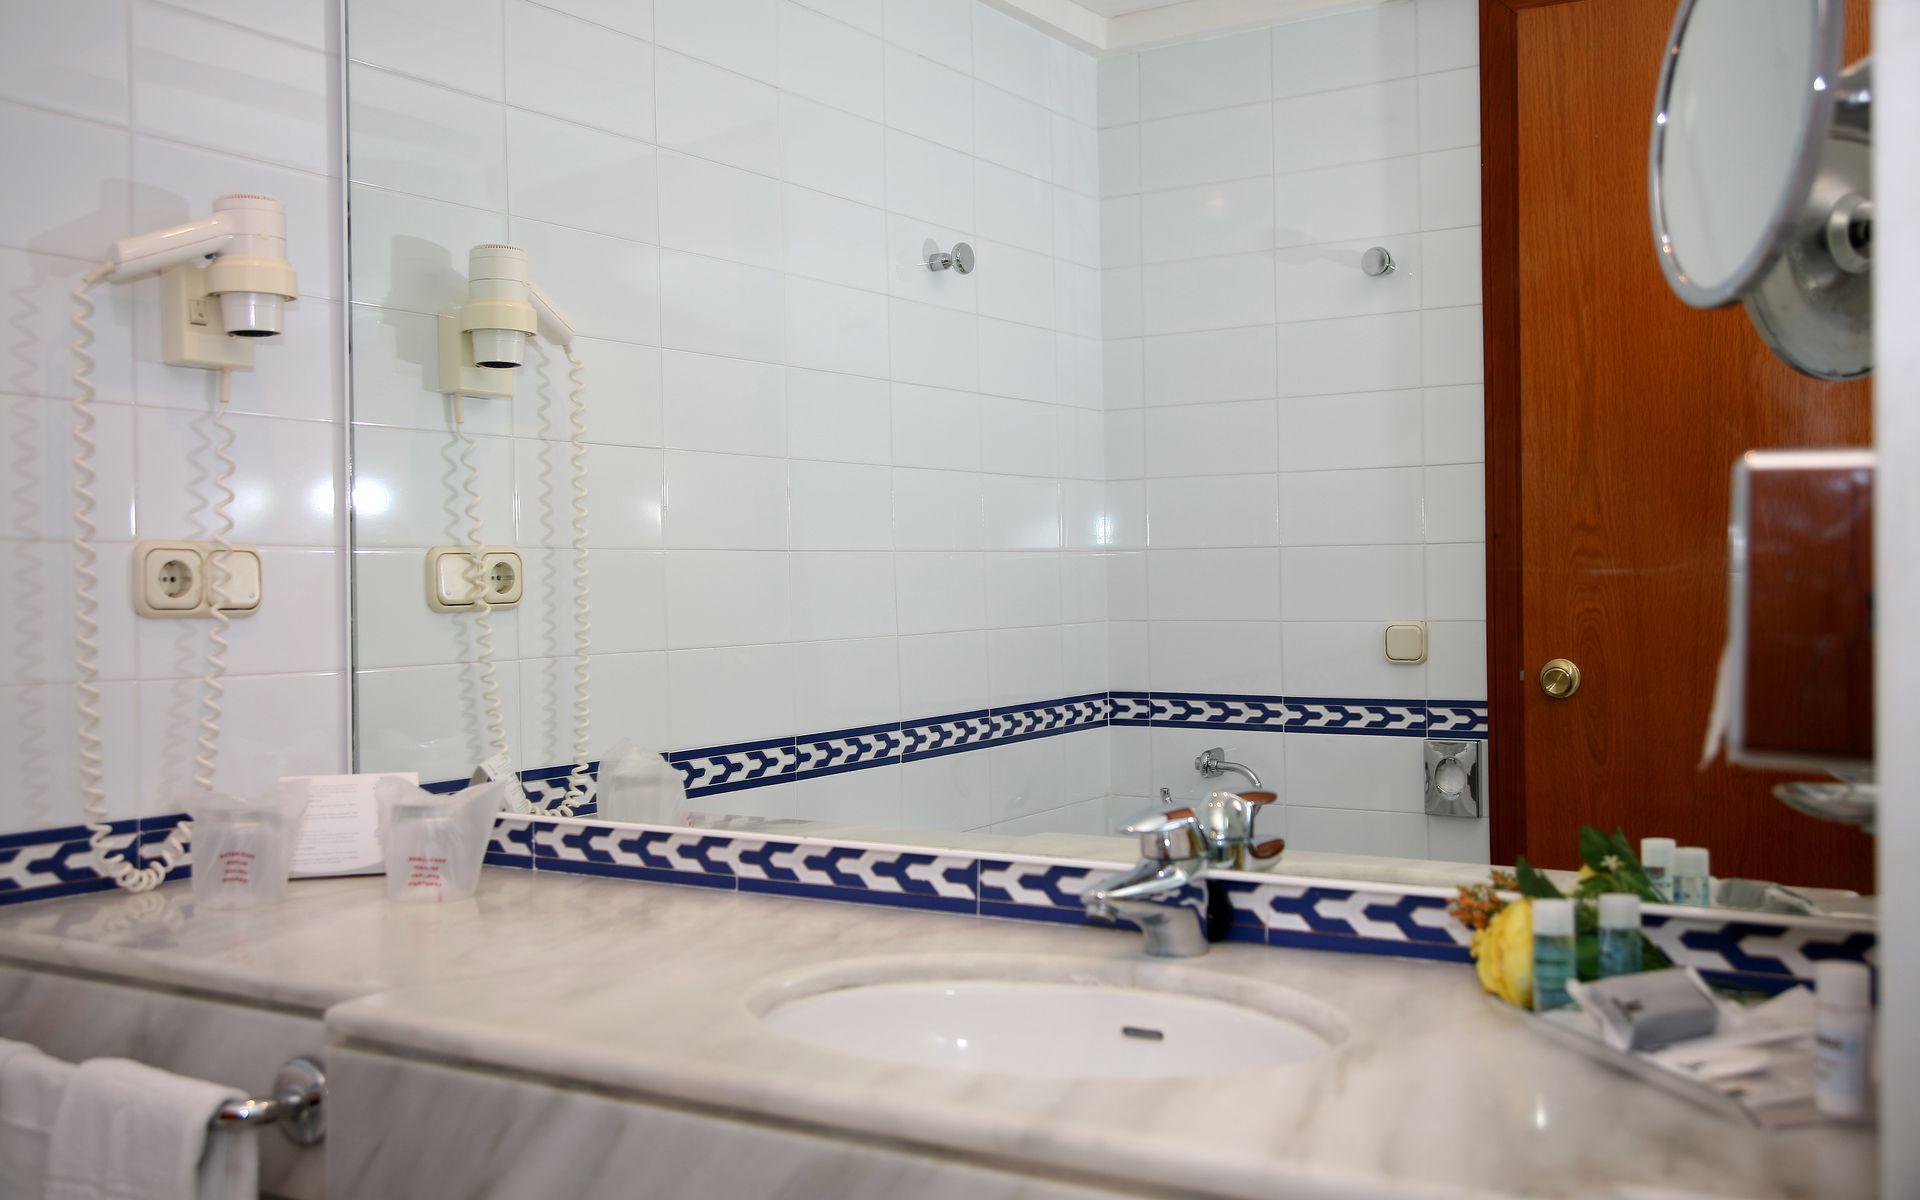 Baño Turco Para Ninos: canales vía satélite tv canales de pago minibar secador de pelo